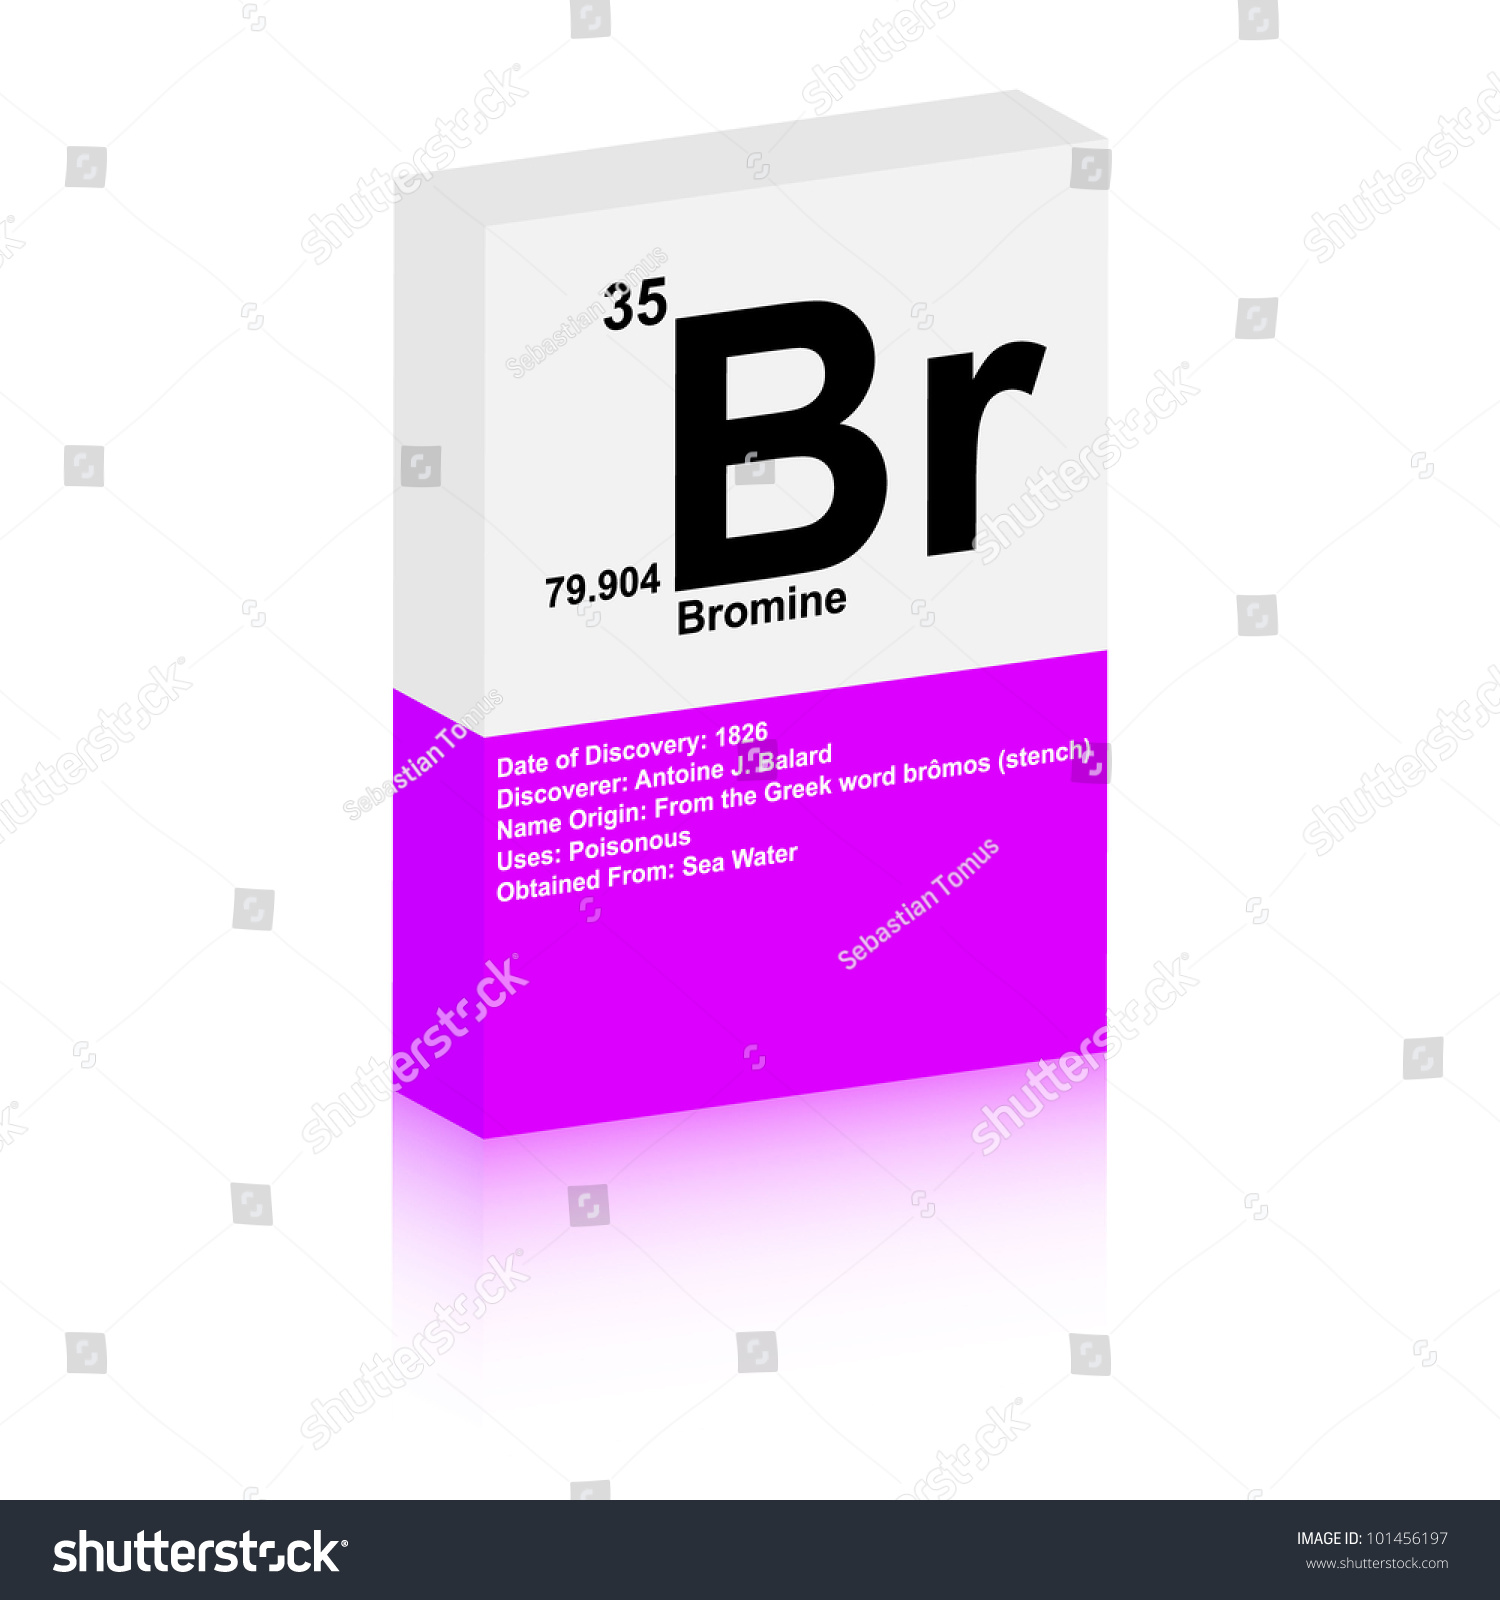 Bromine symbol stock vector 101456197 shutterstock bromine symbol gamestrikefo Image collections